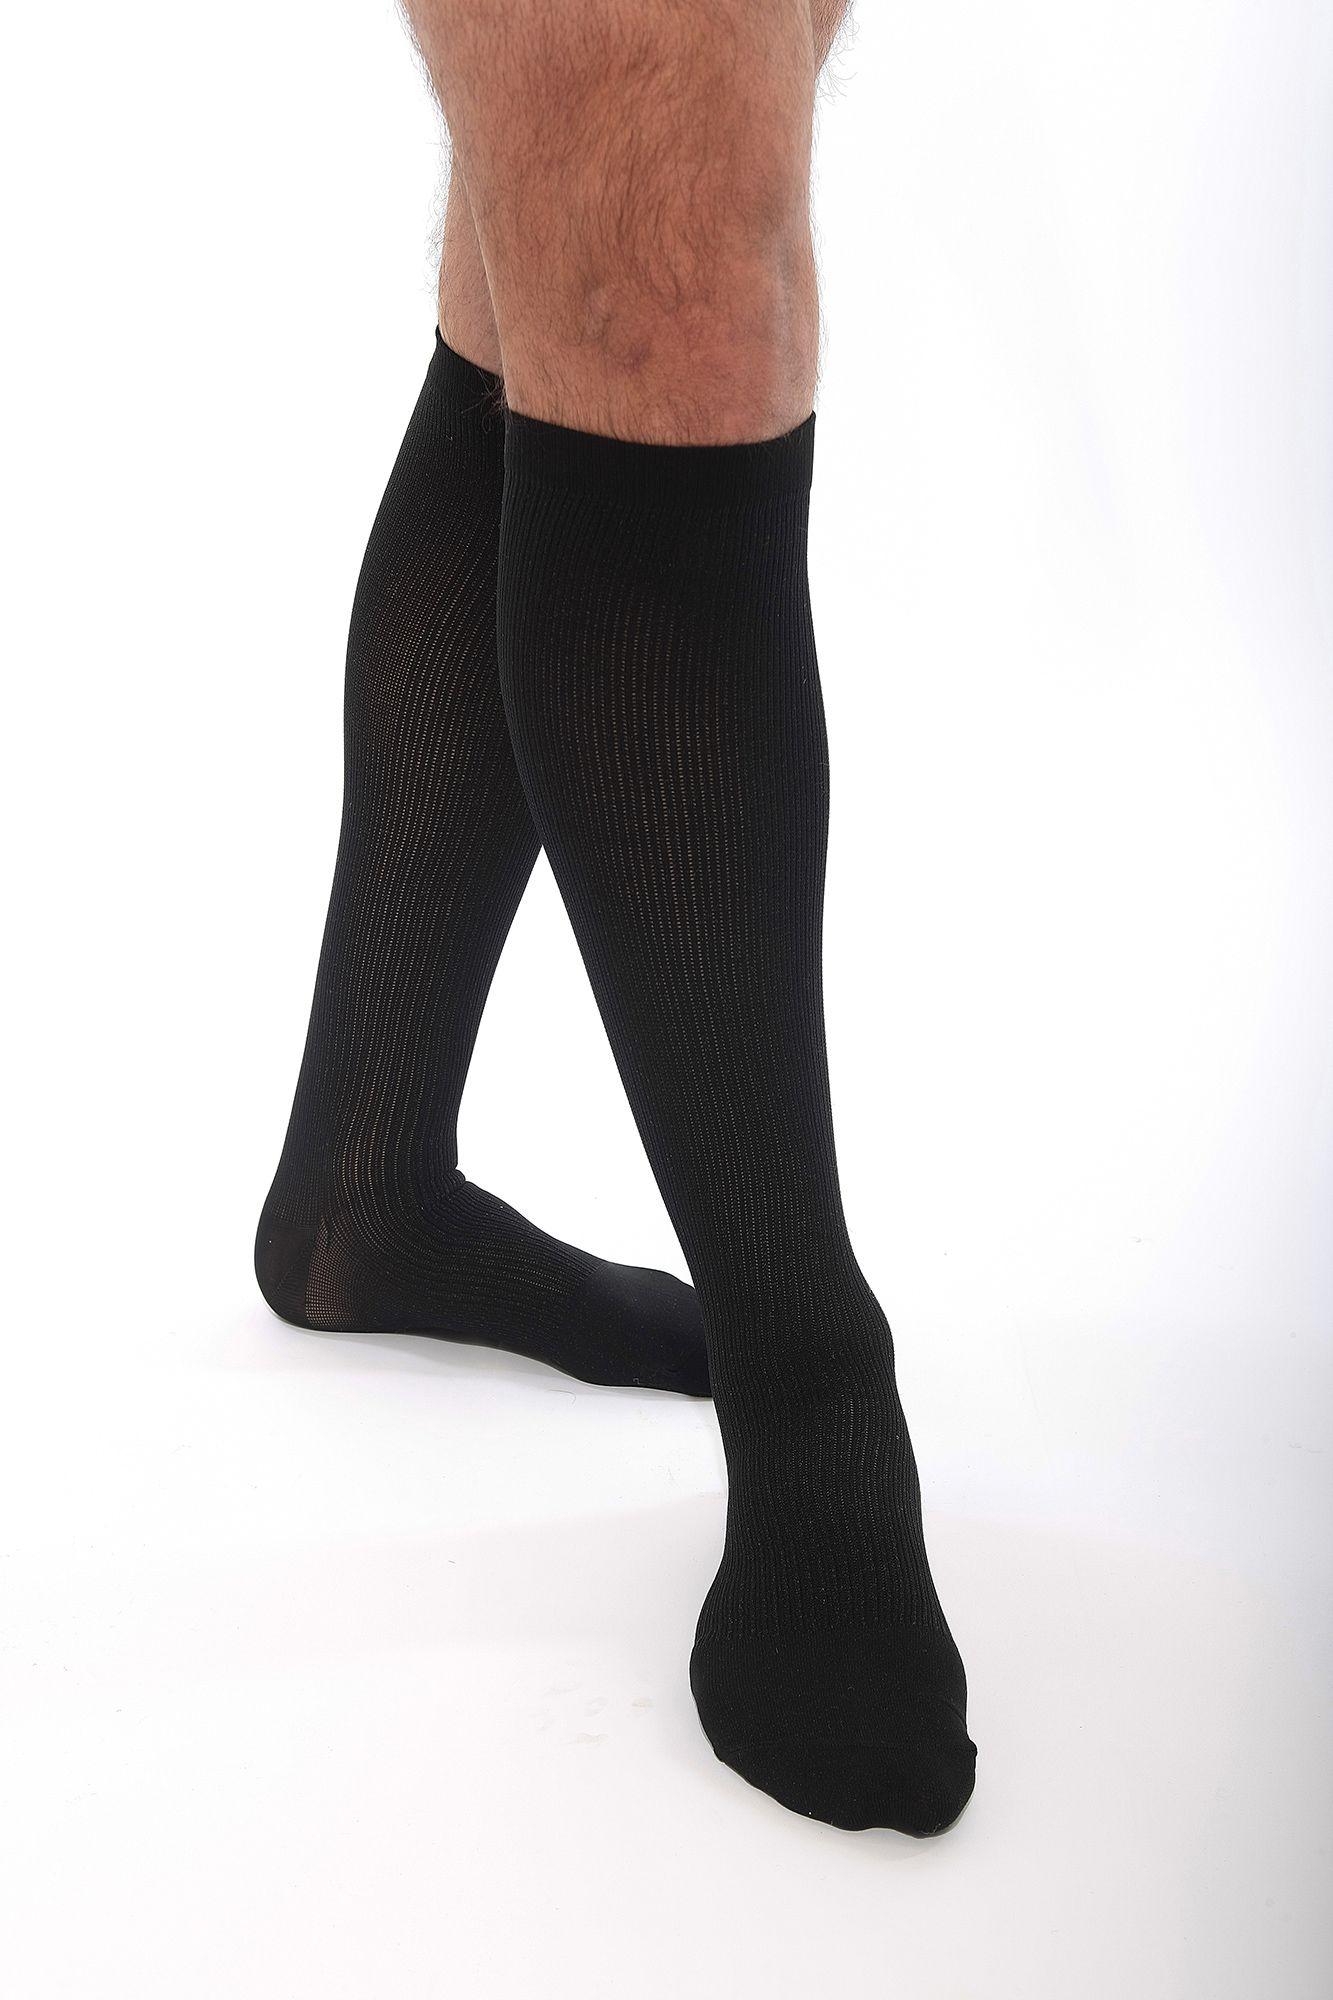 Venosan 174 Silverline Mens Compression Socks 20 30mmhg Daylong